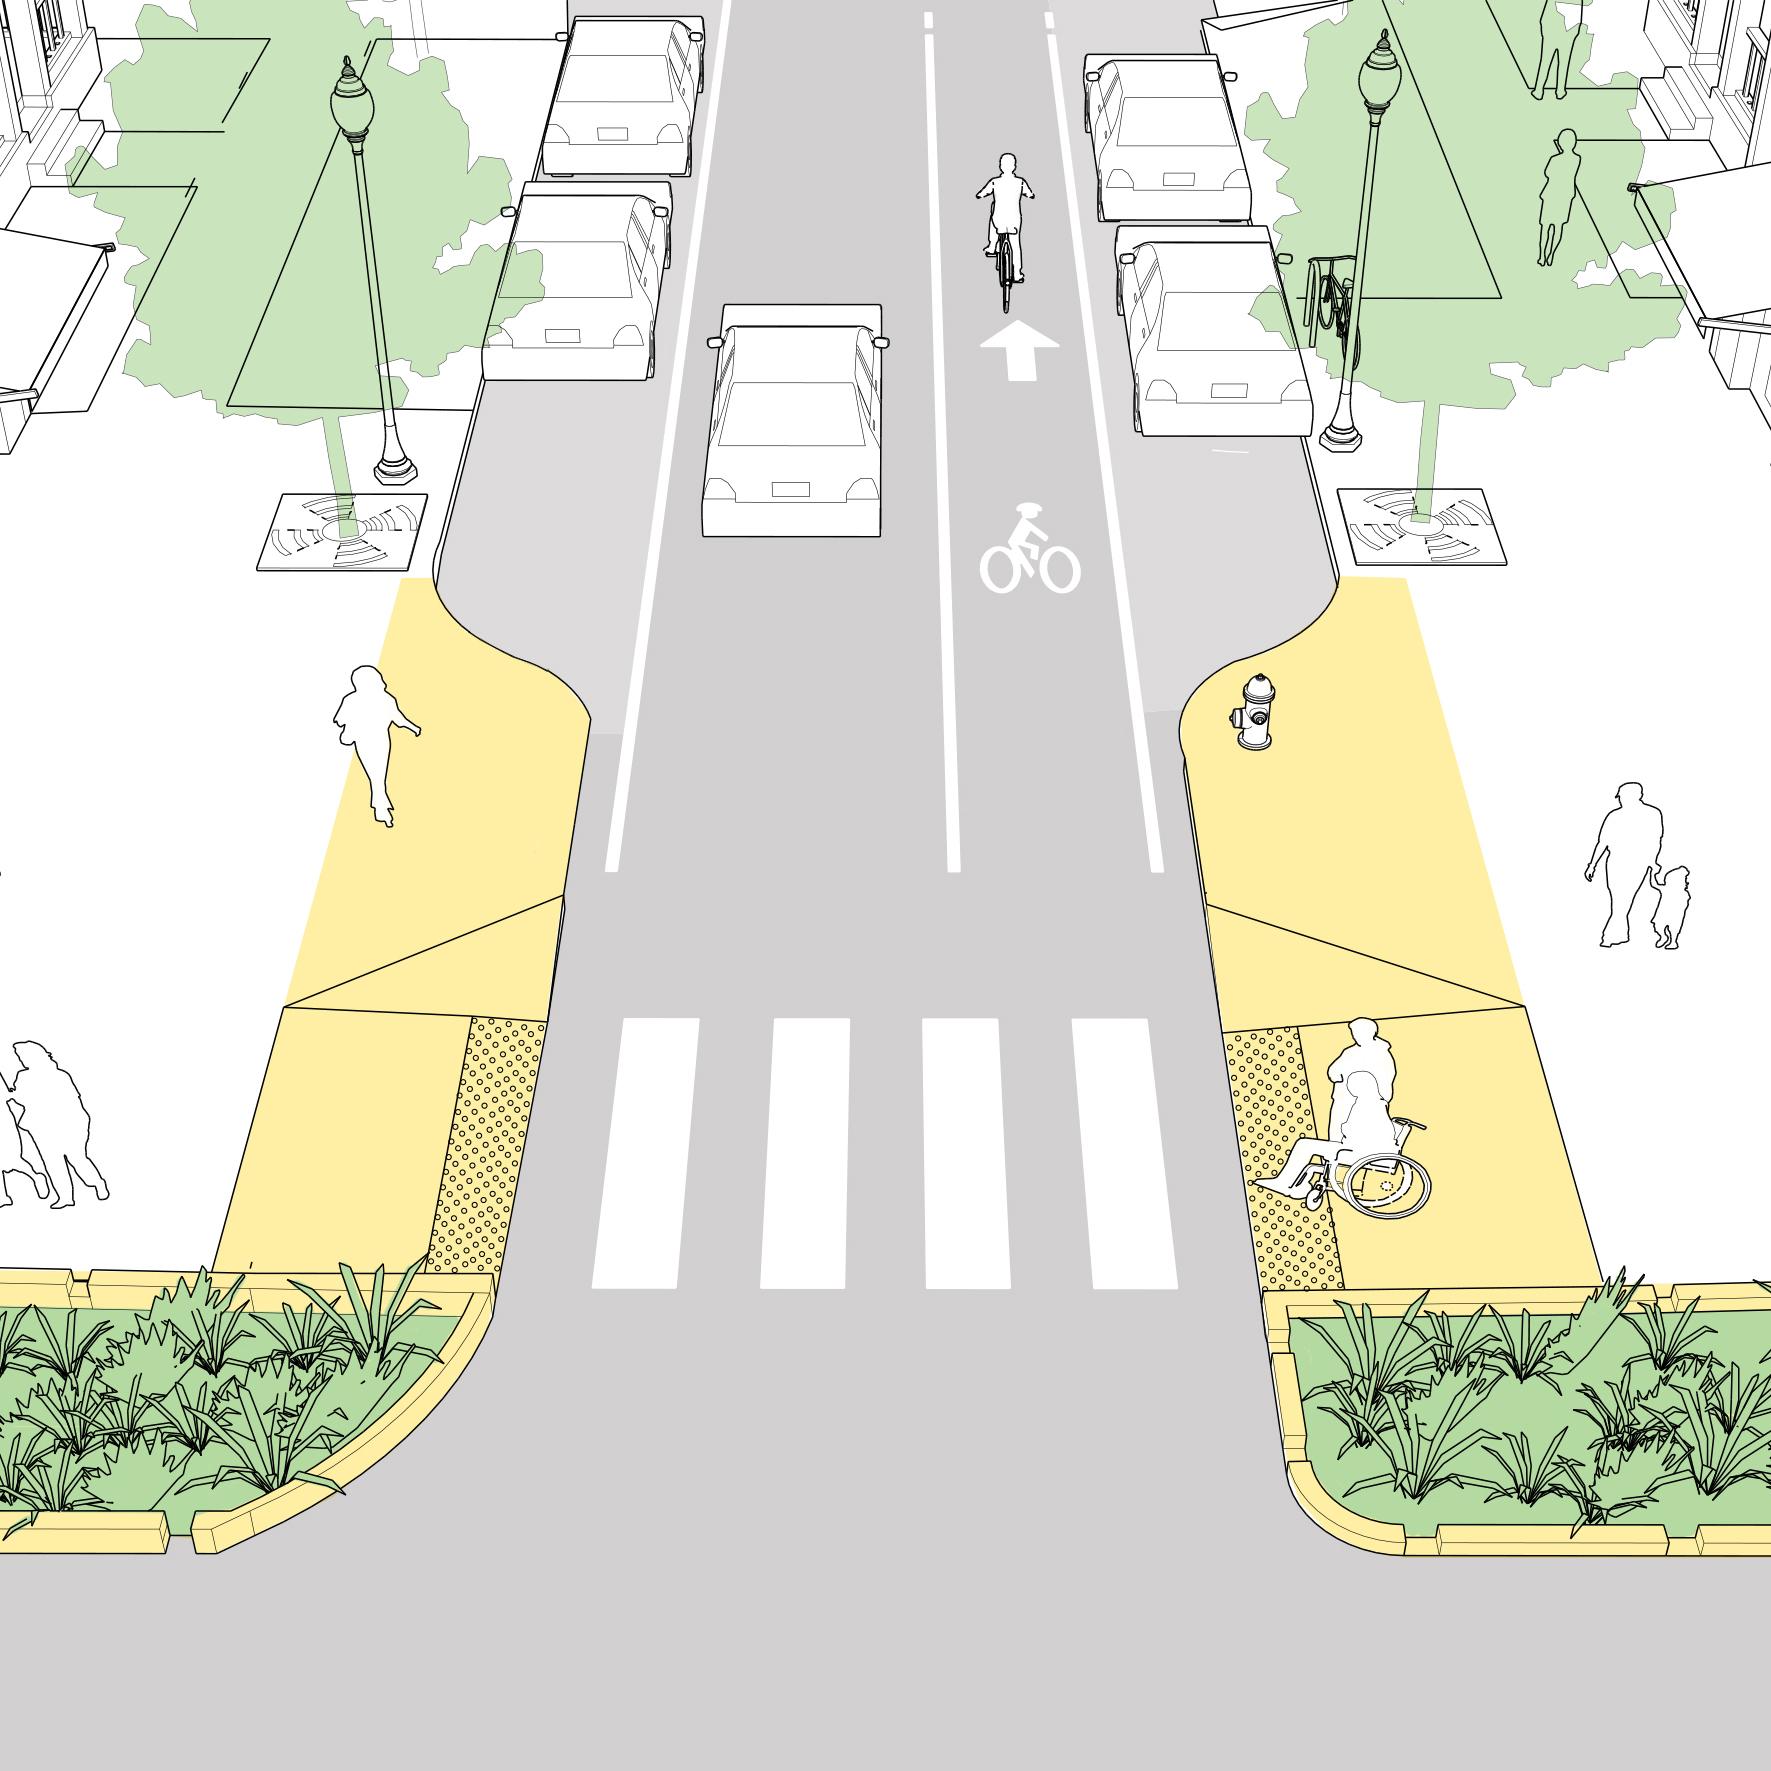 Street Furniture Design Guidelines gateway - national association of city transportation officials